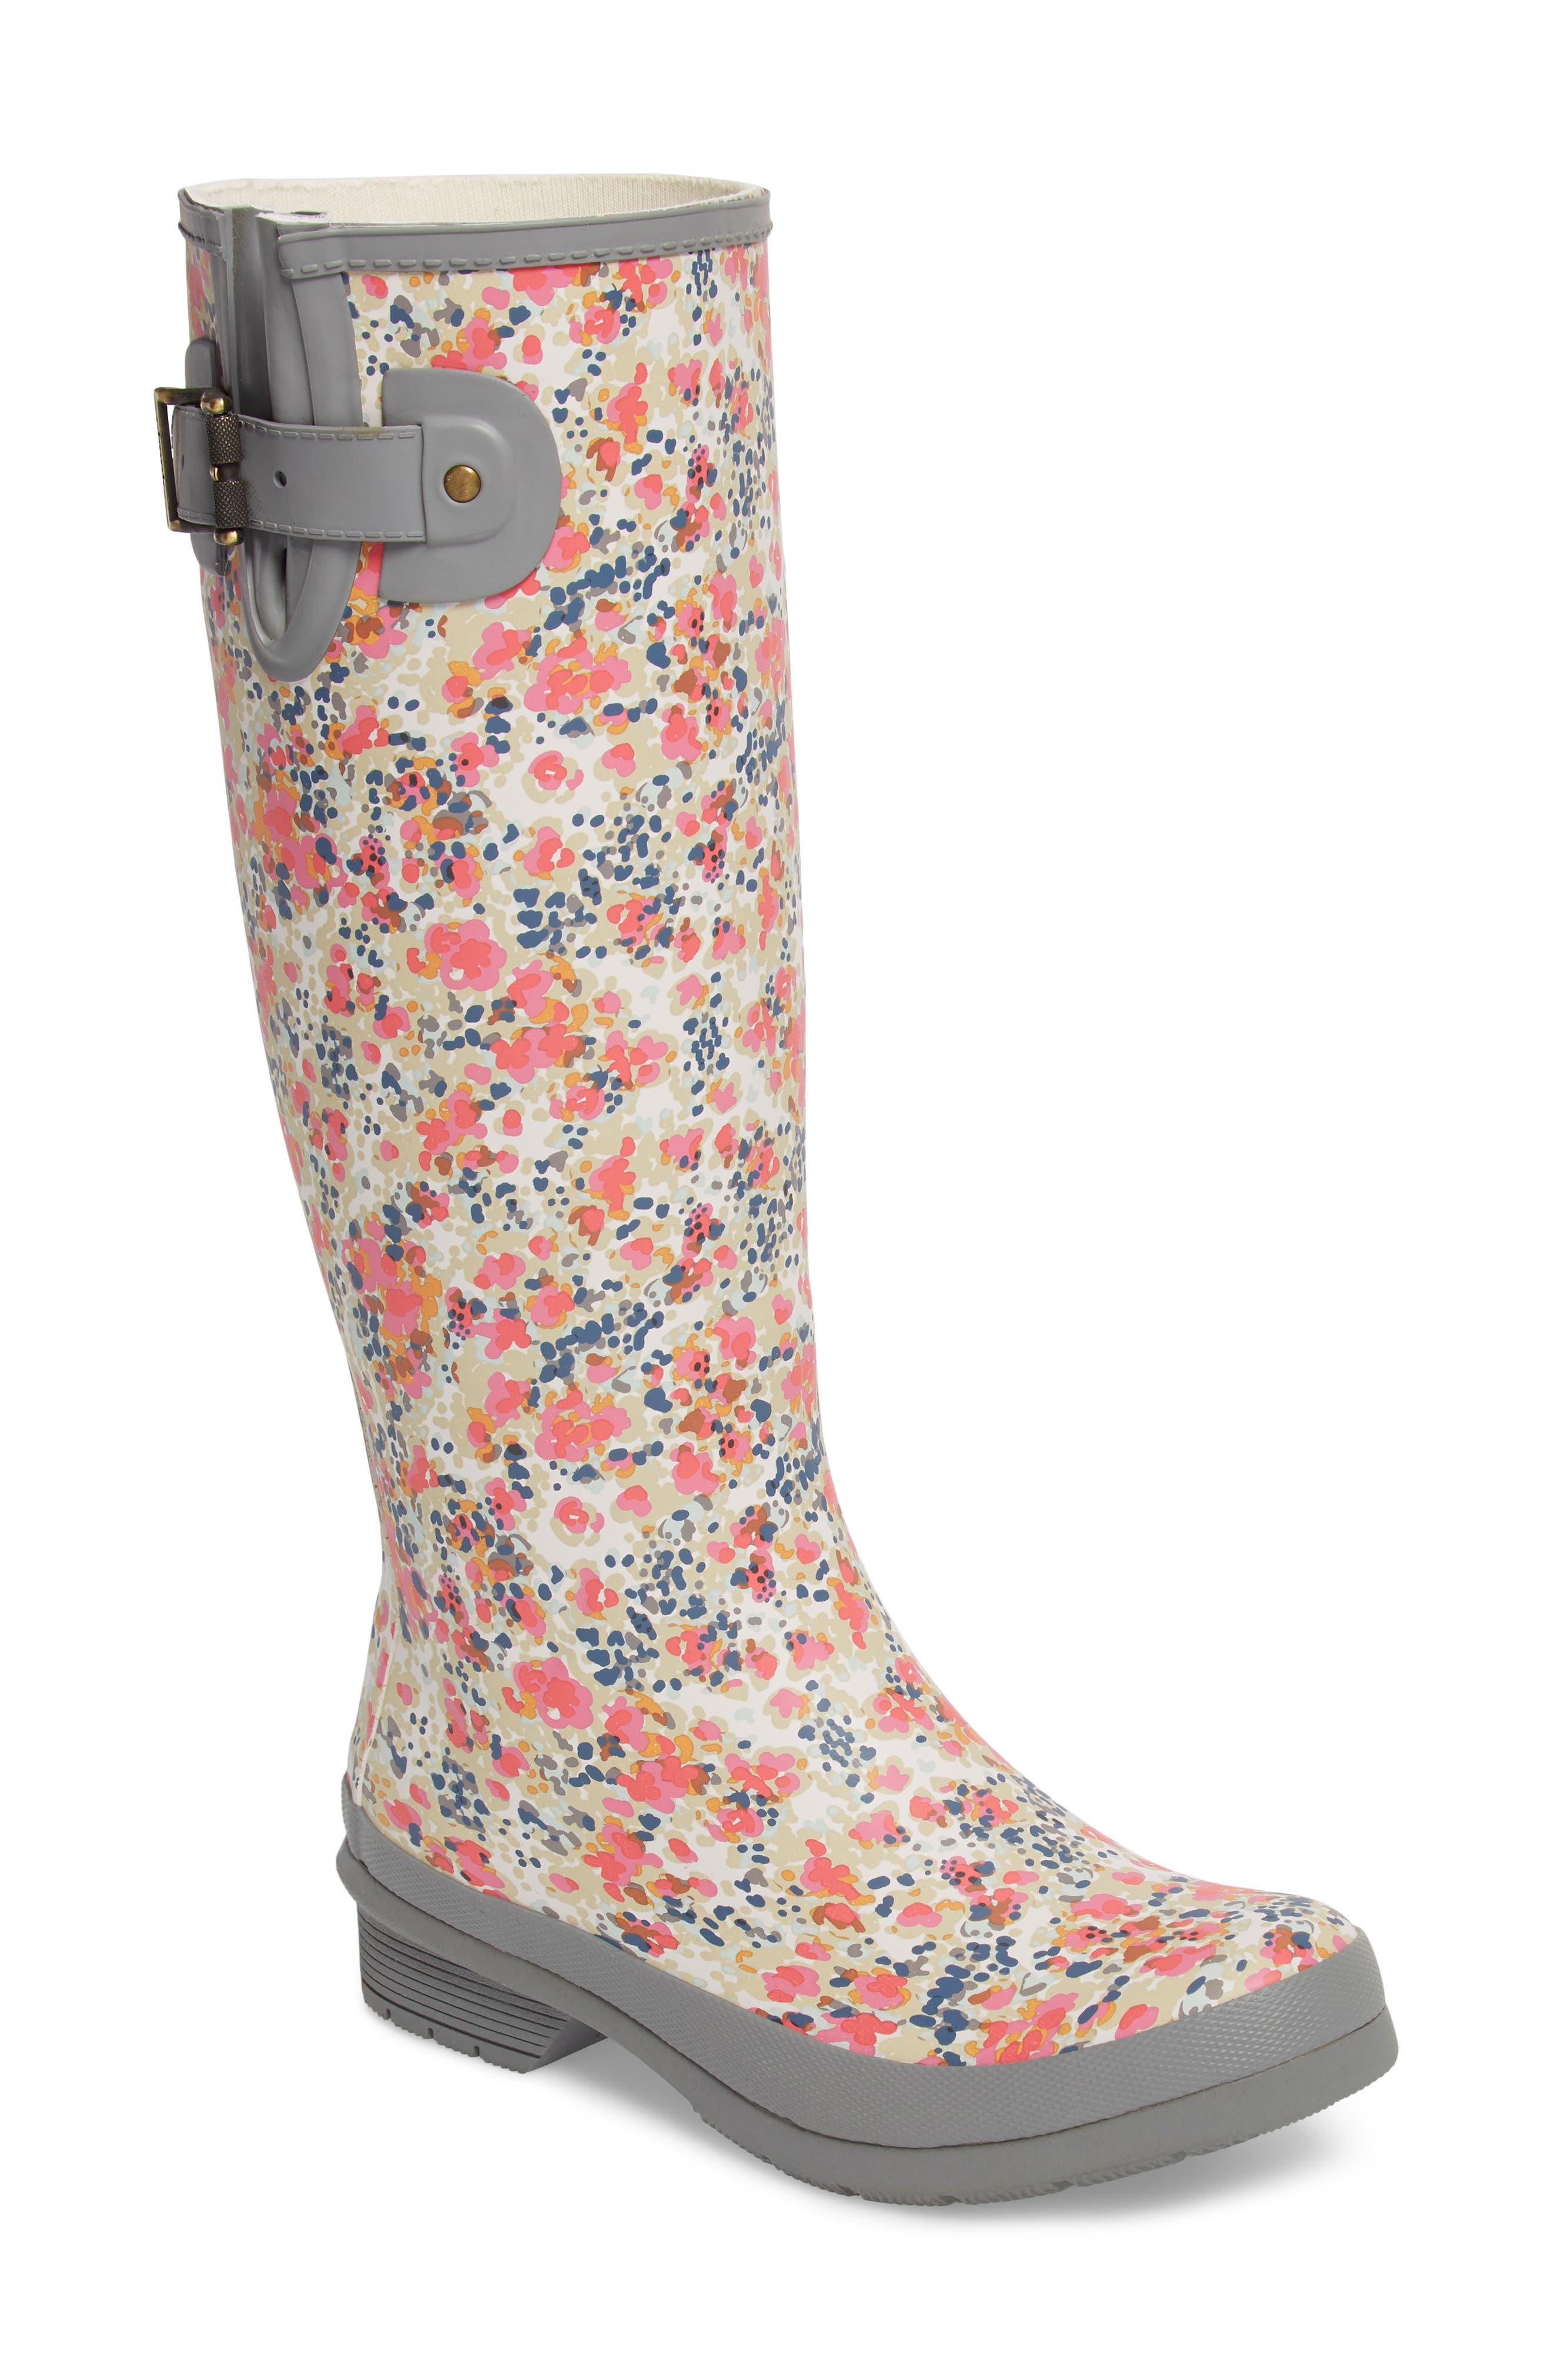 ChookaJulia Rain Boots 0RWBz1bvH